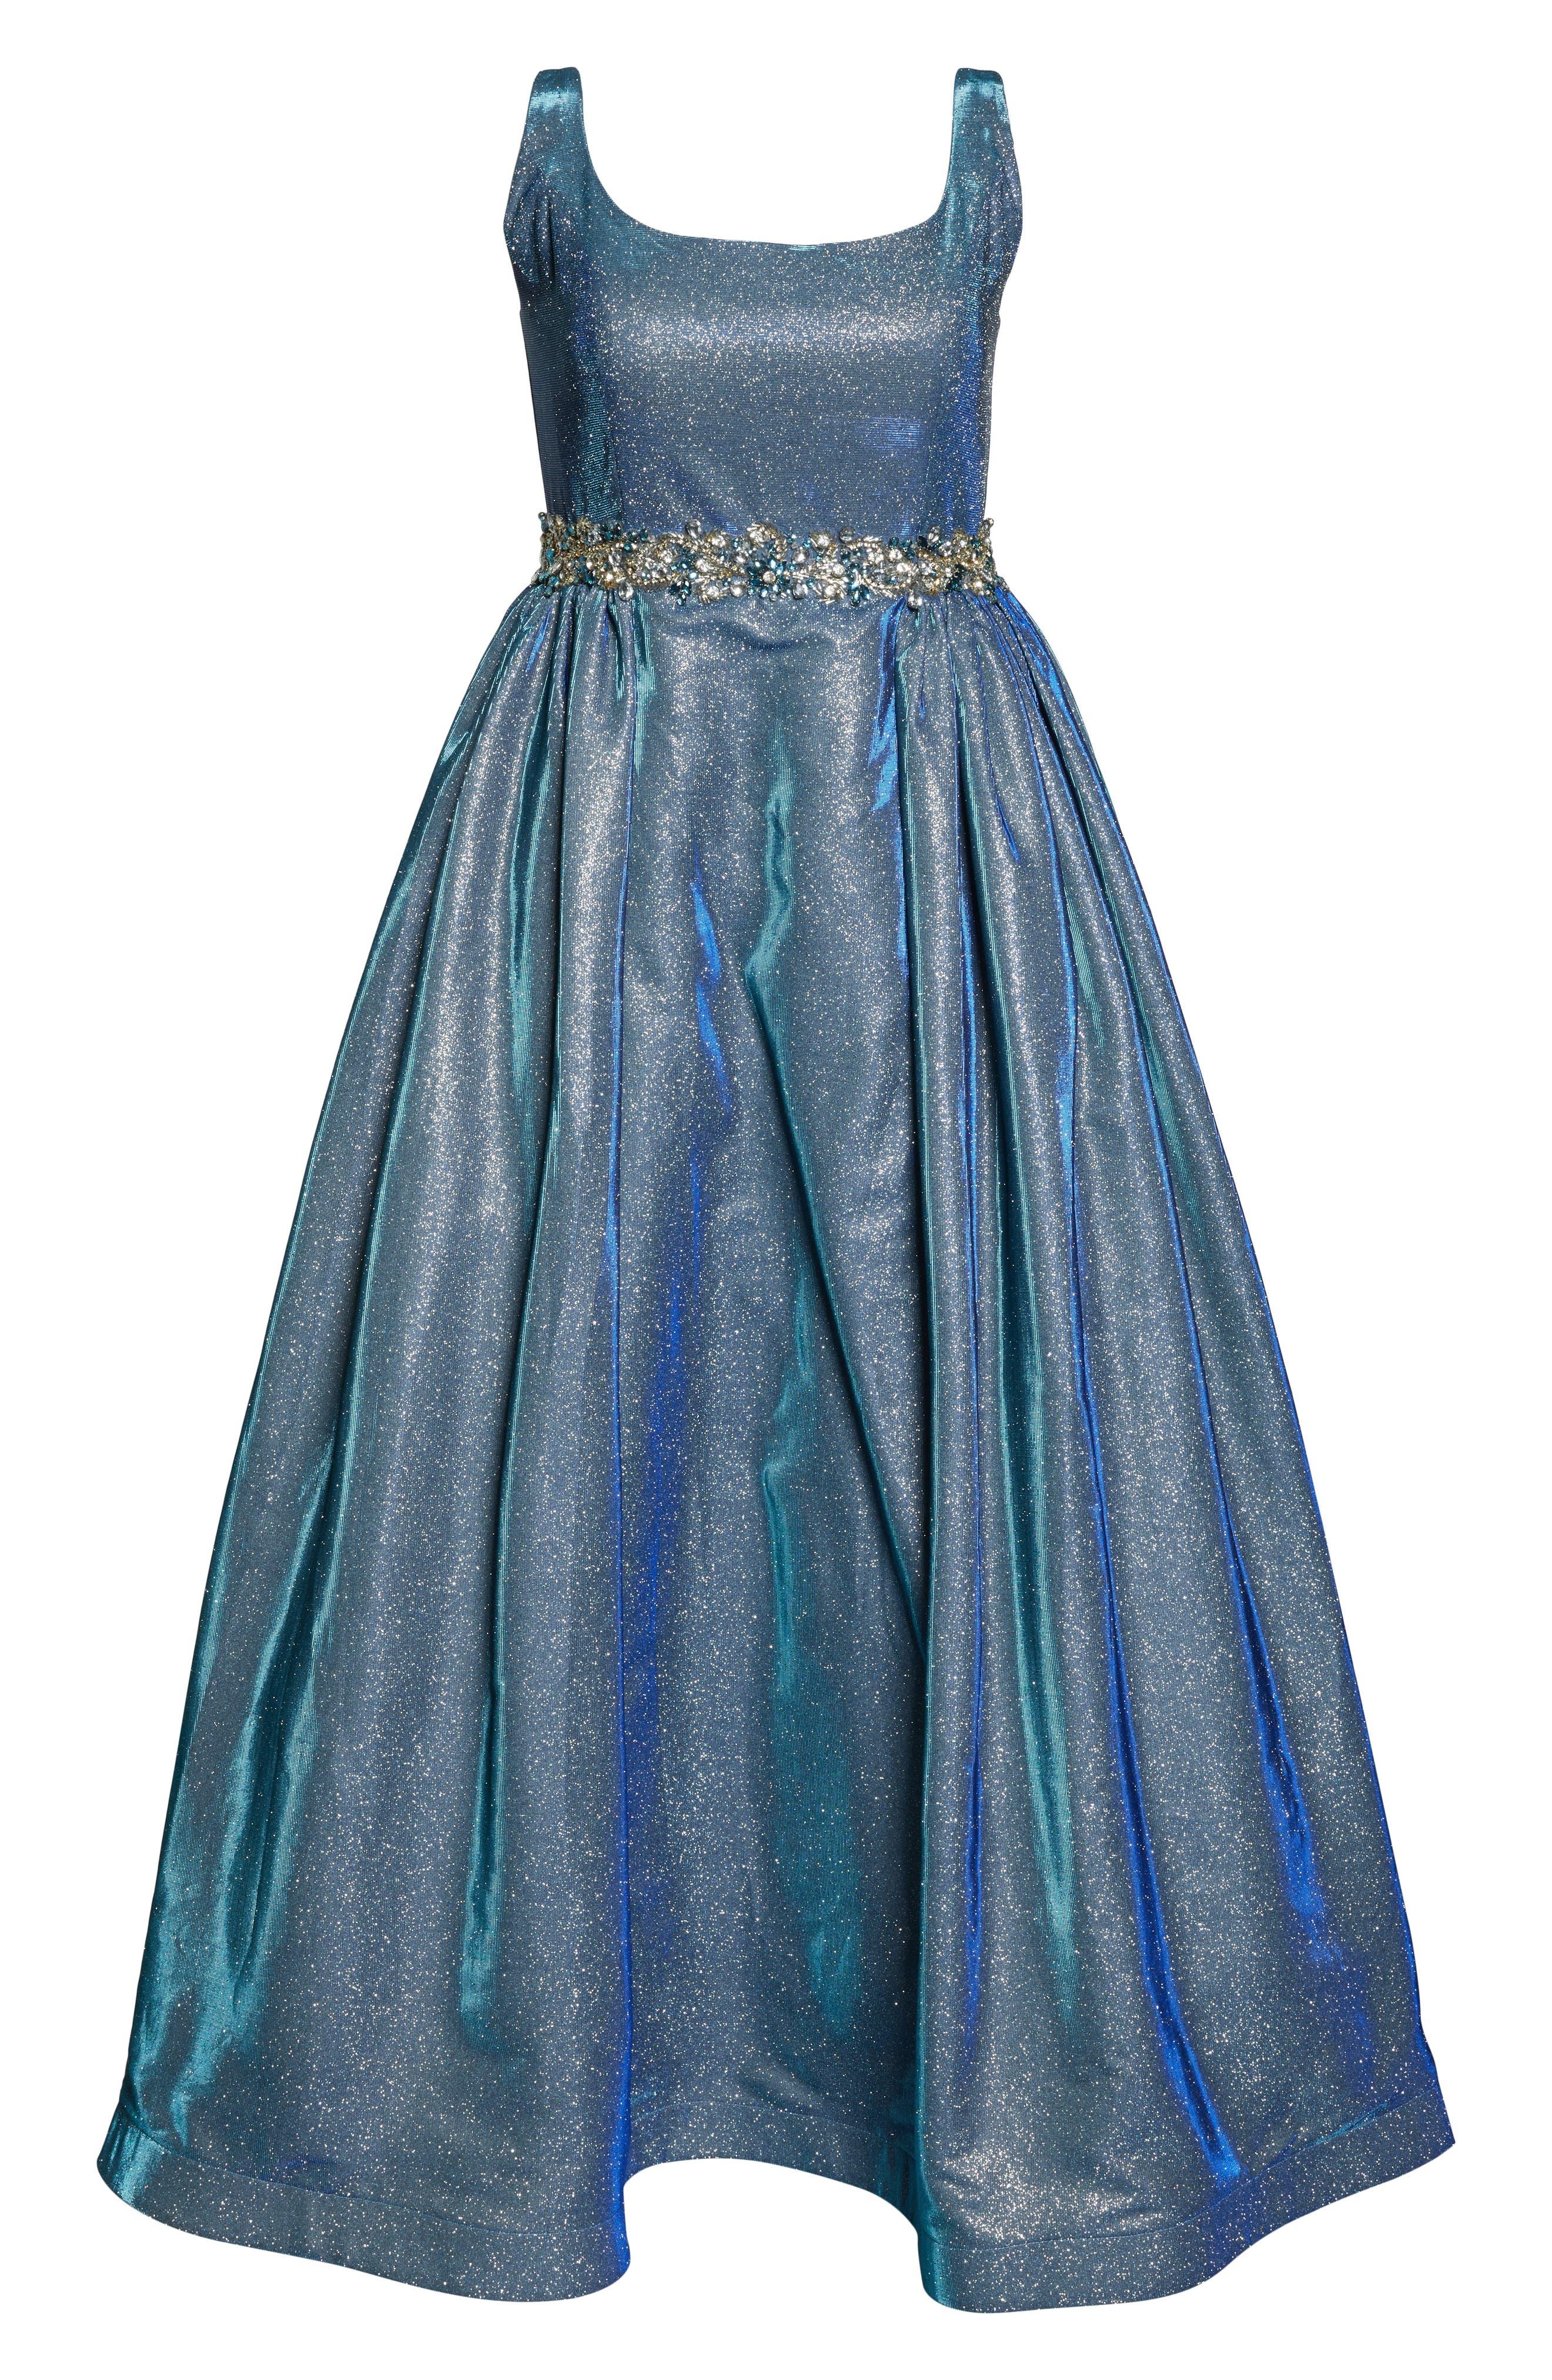 MAC DUGGAL, Jeweled Waist Metallic Evening Dress, Alternate thumbnail 7, color, BLUE